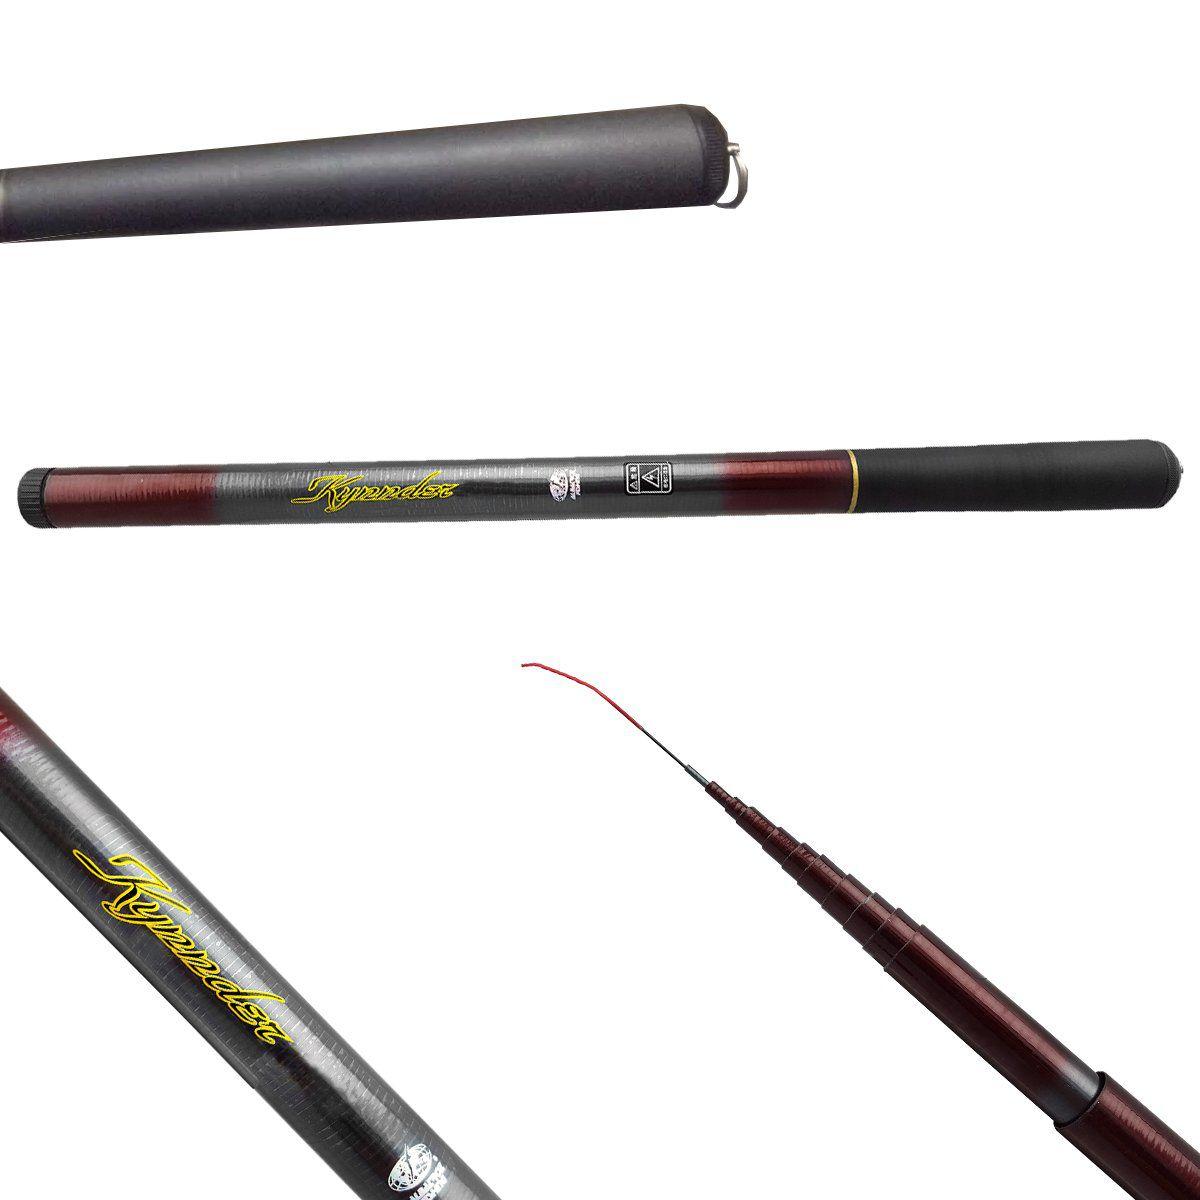 Vara Telescópica Albatroz Fishing Kynnder 2709 2,70m 9s